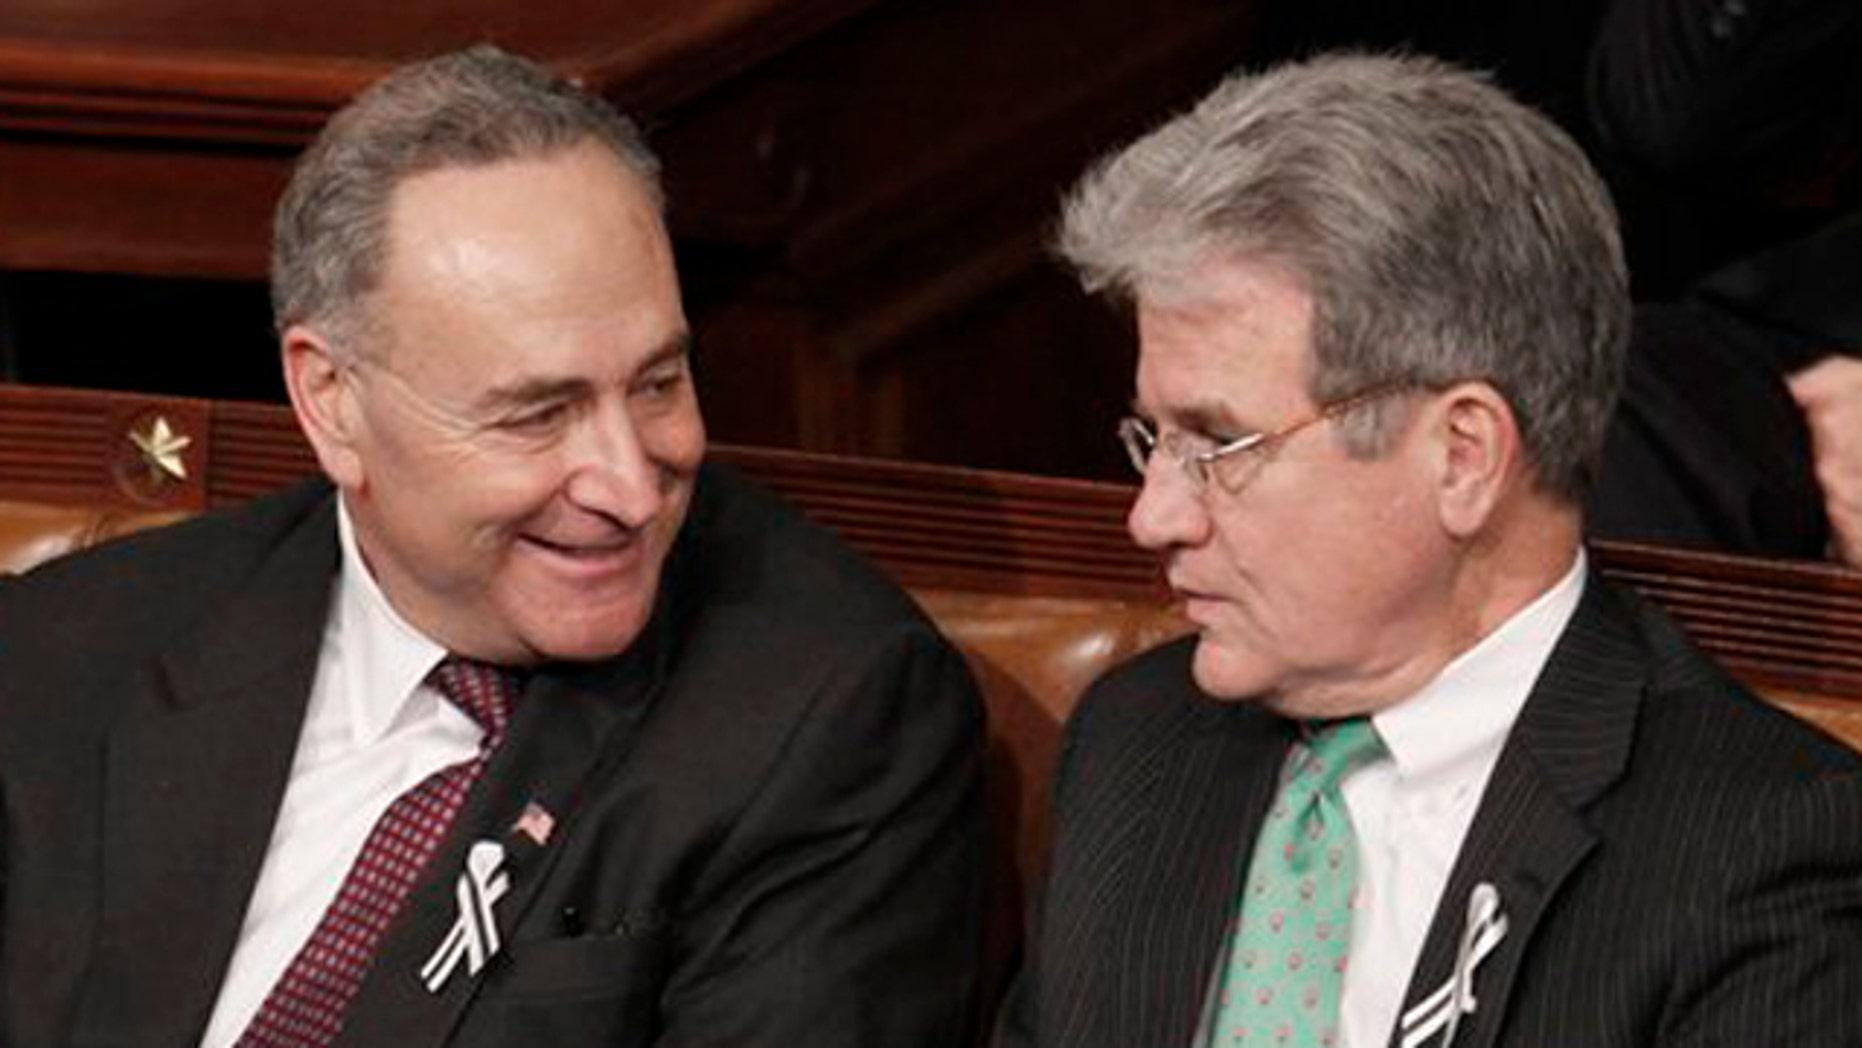 Sen, Charles Schumer, D-N.Y., left, talks with Sen. Tom Coburn, R-Okla., on Capitol Hill in Washington, during President Barack Obama's State of the Union address in Washington.